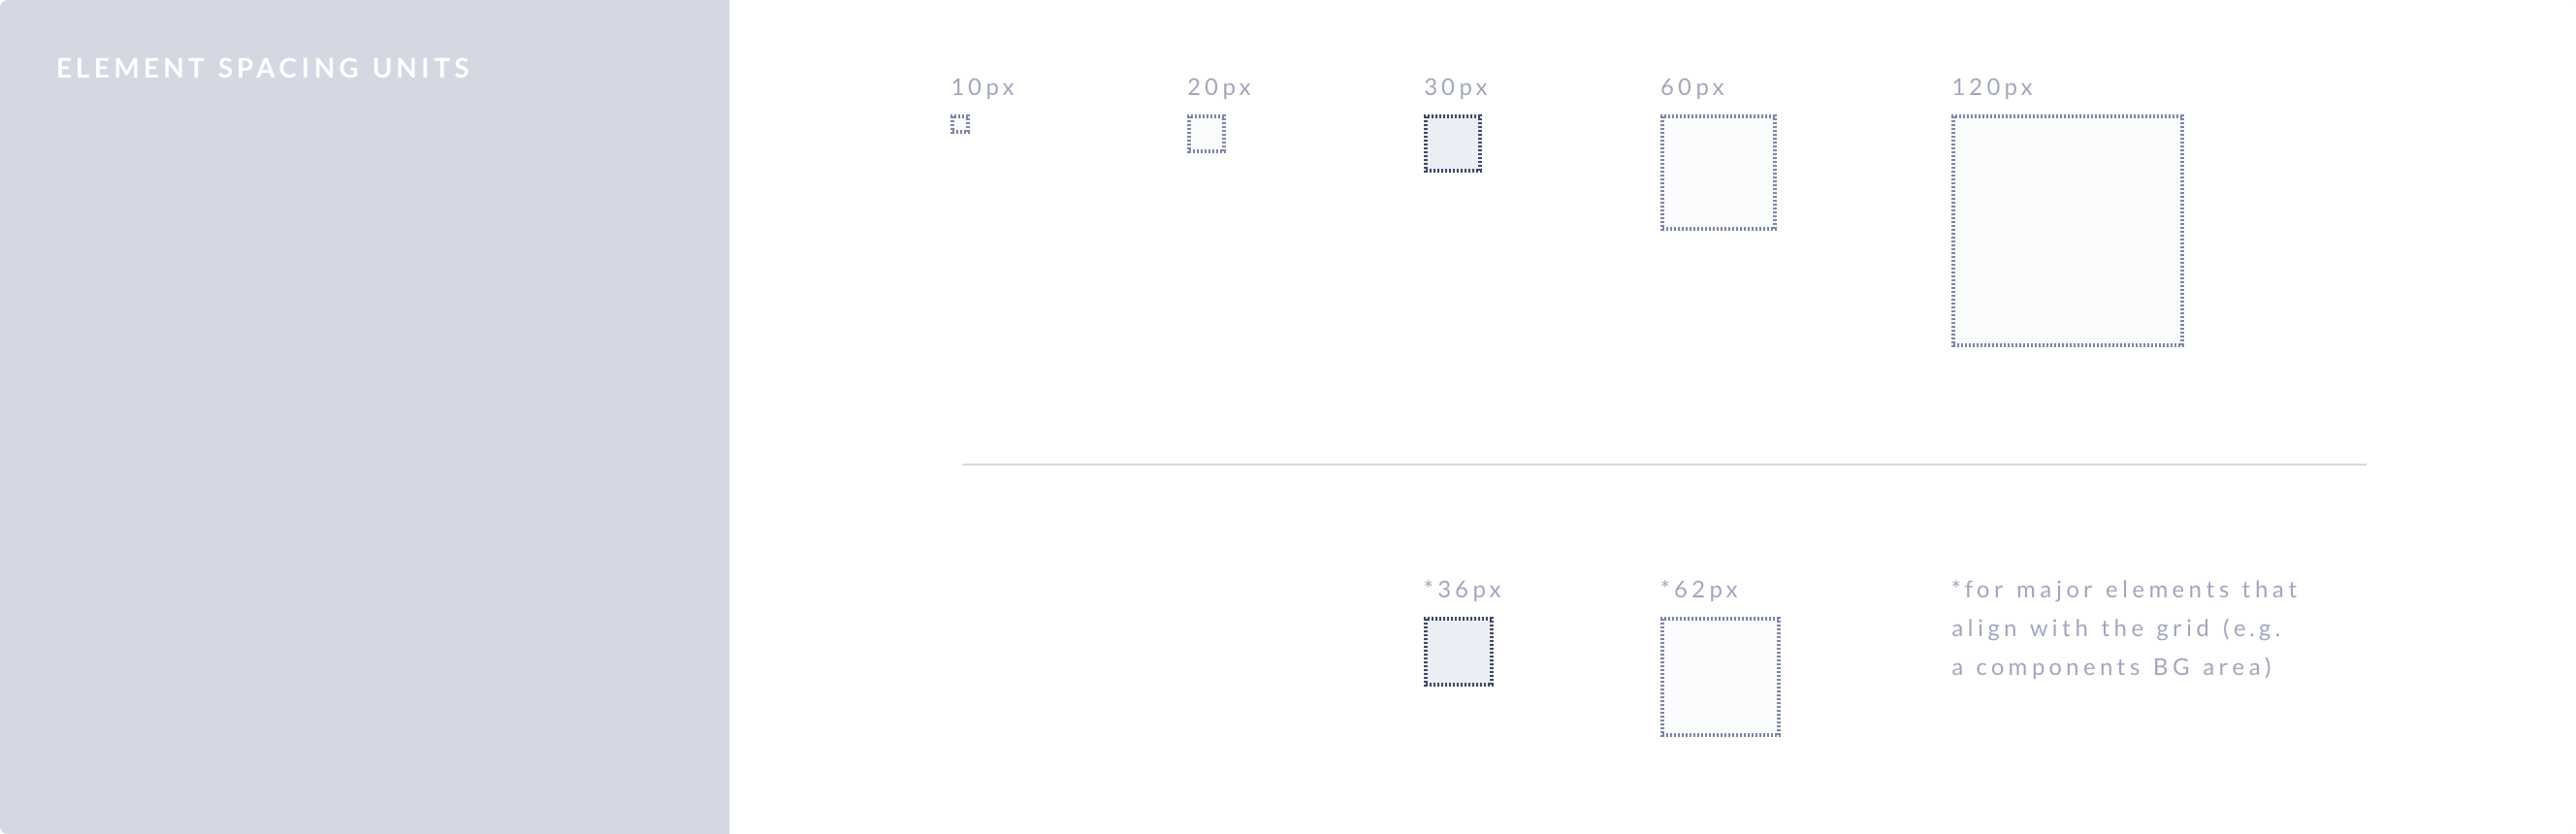 smart host element spacing units